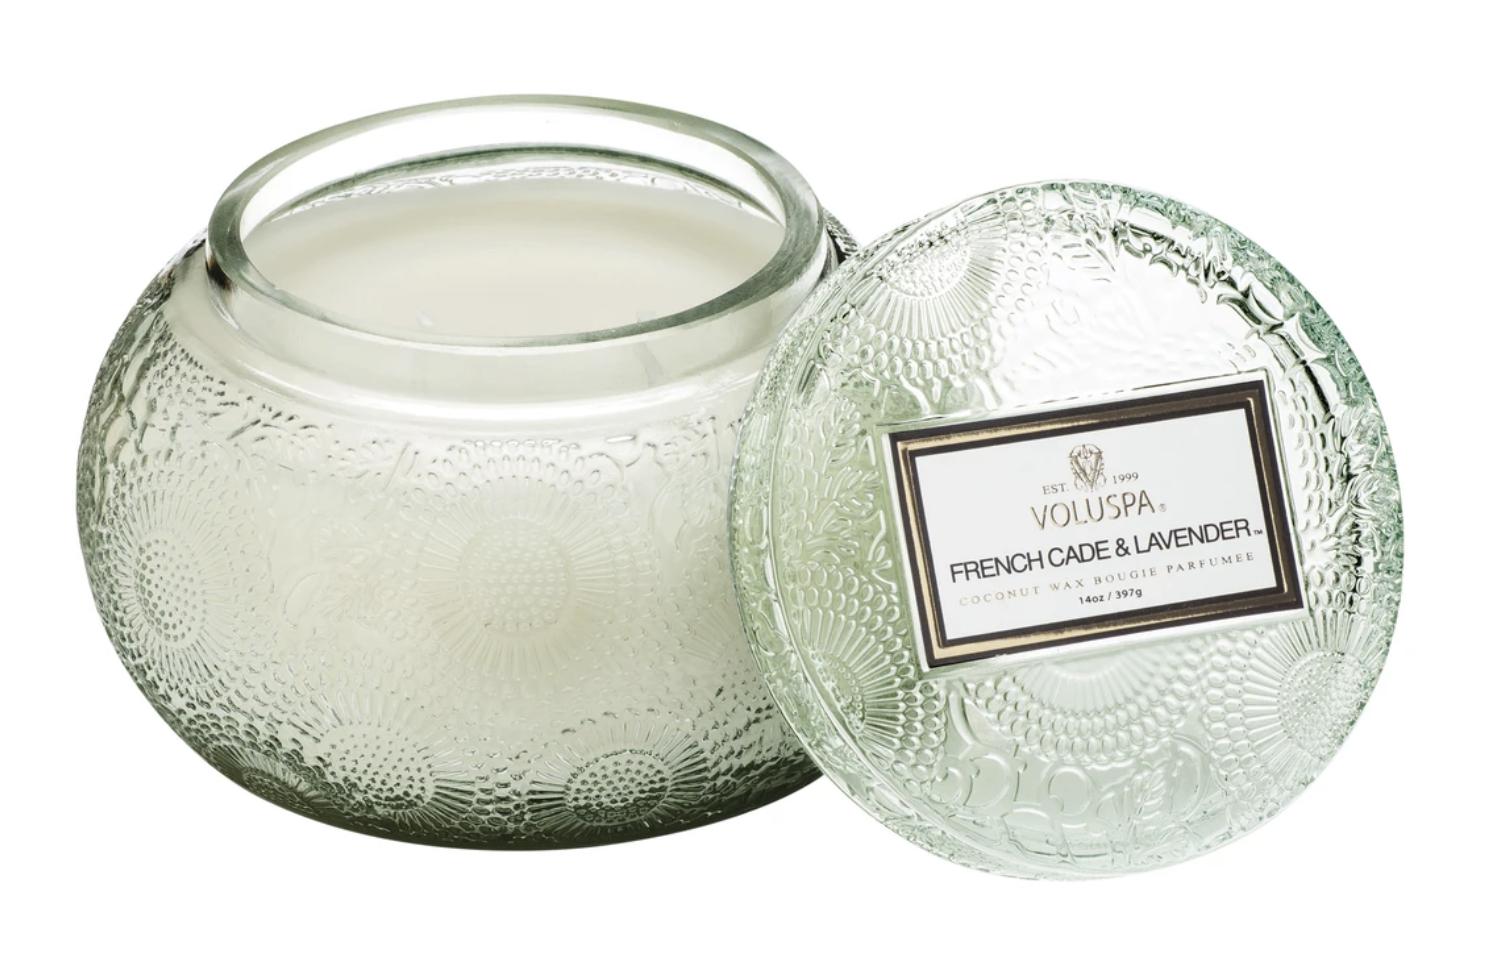 Voluspa French Cade Lavender, Glass Chawan Bowl Candle